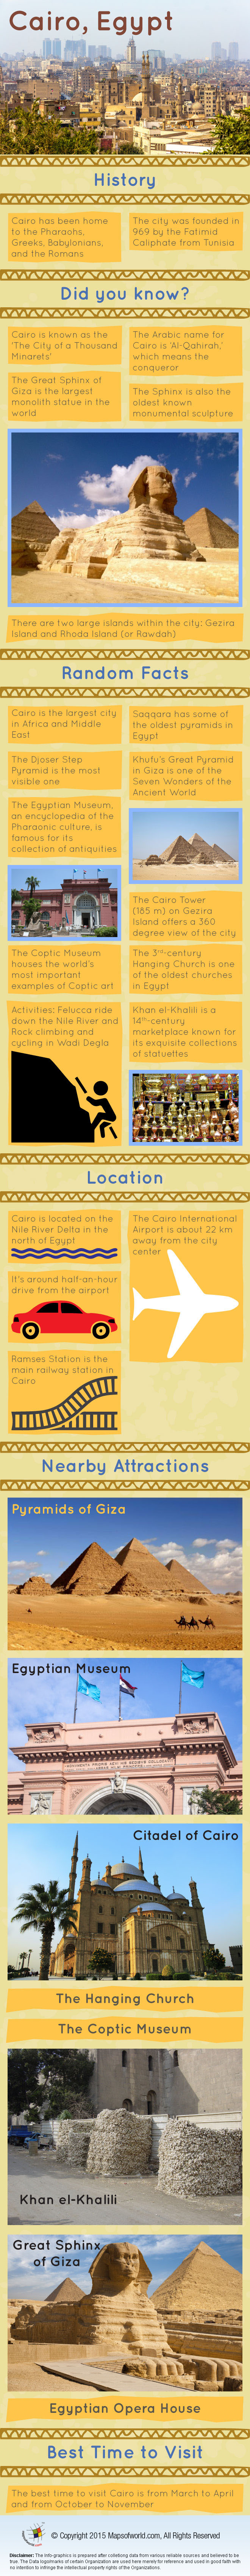 Cairo Infographic